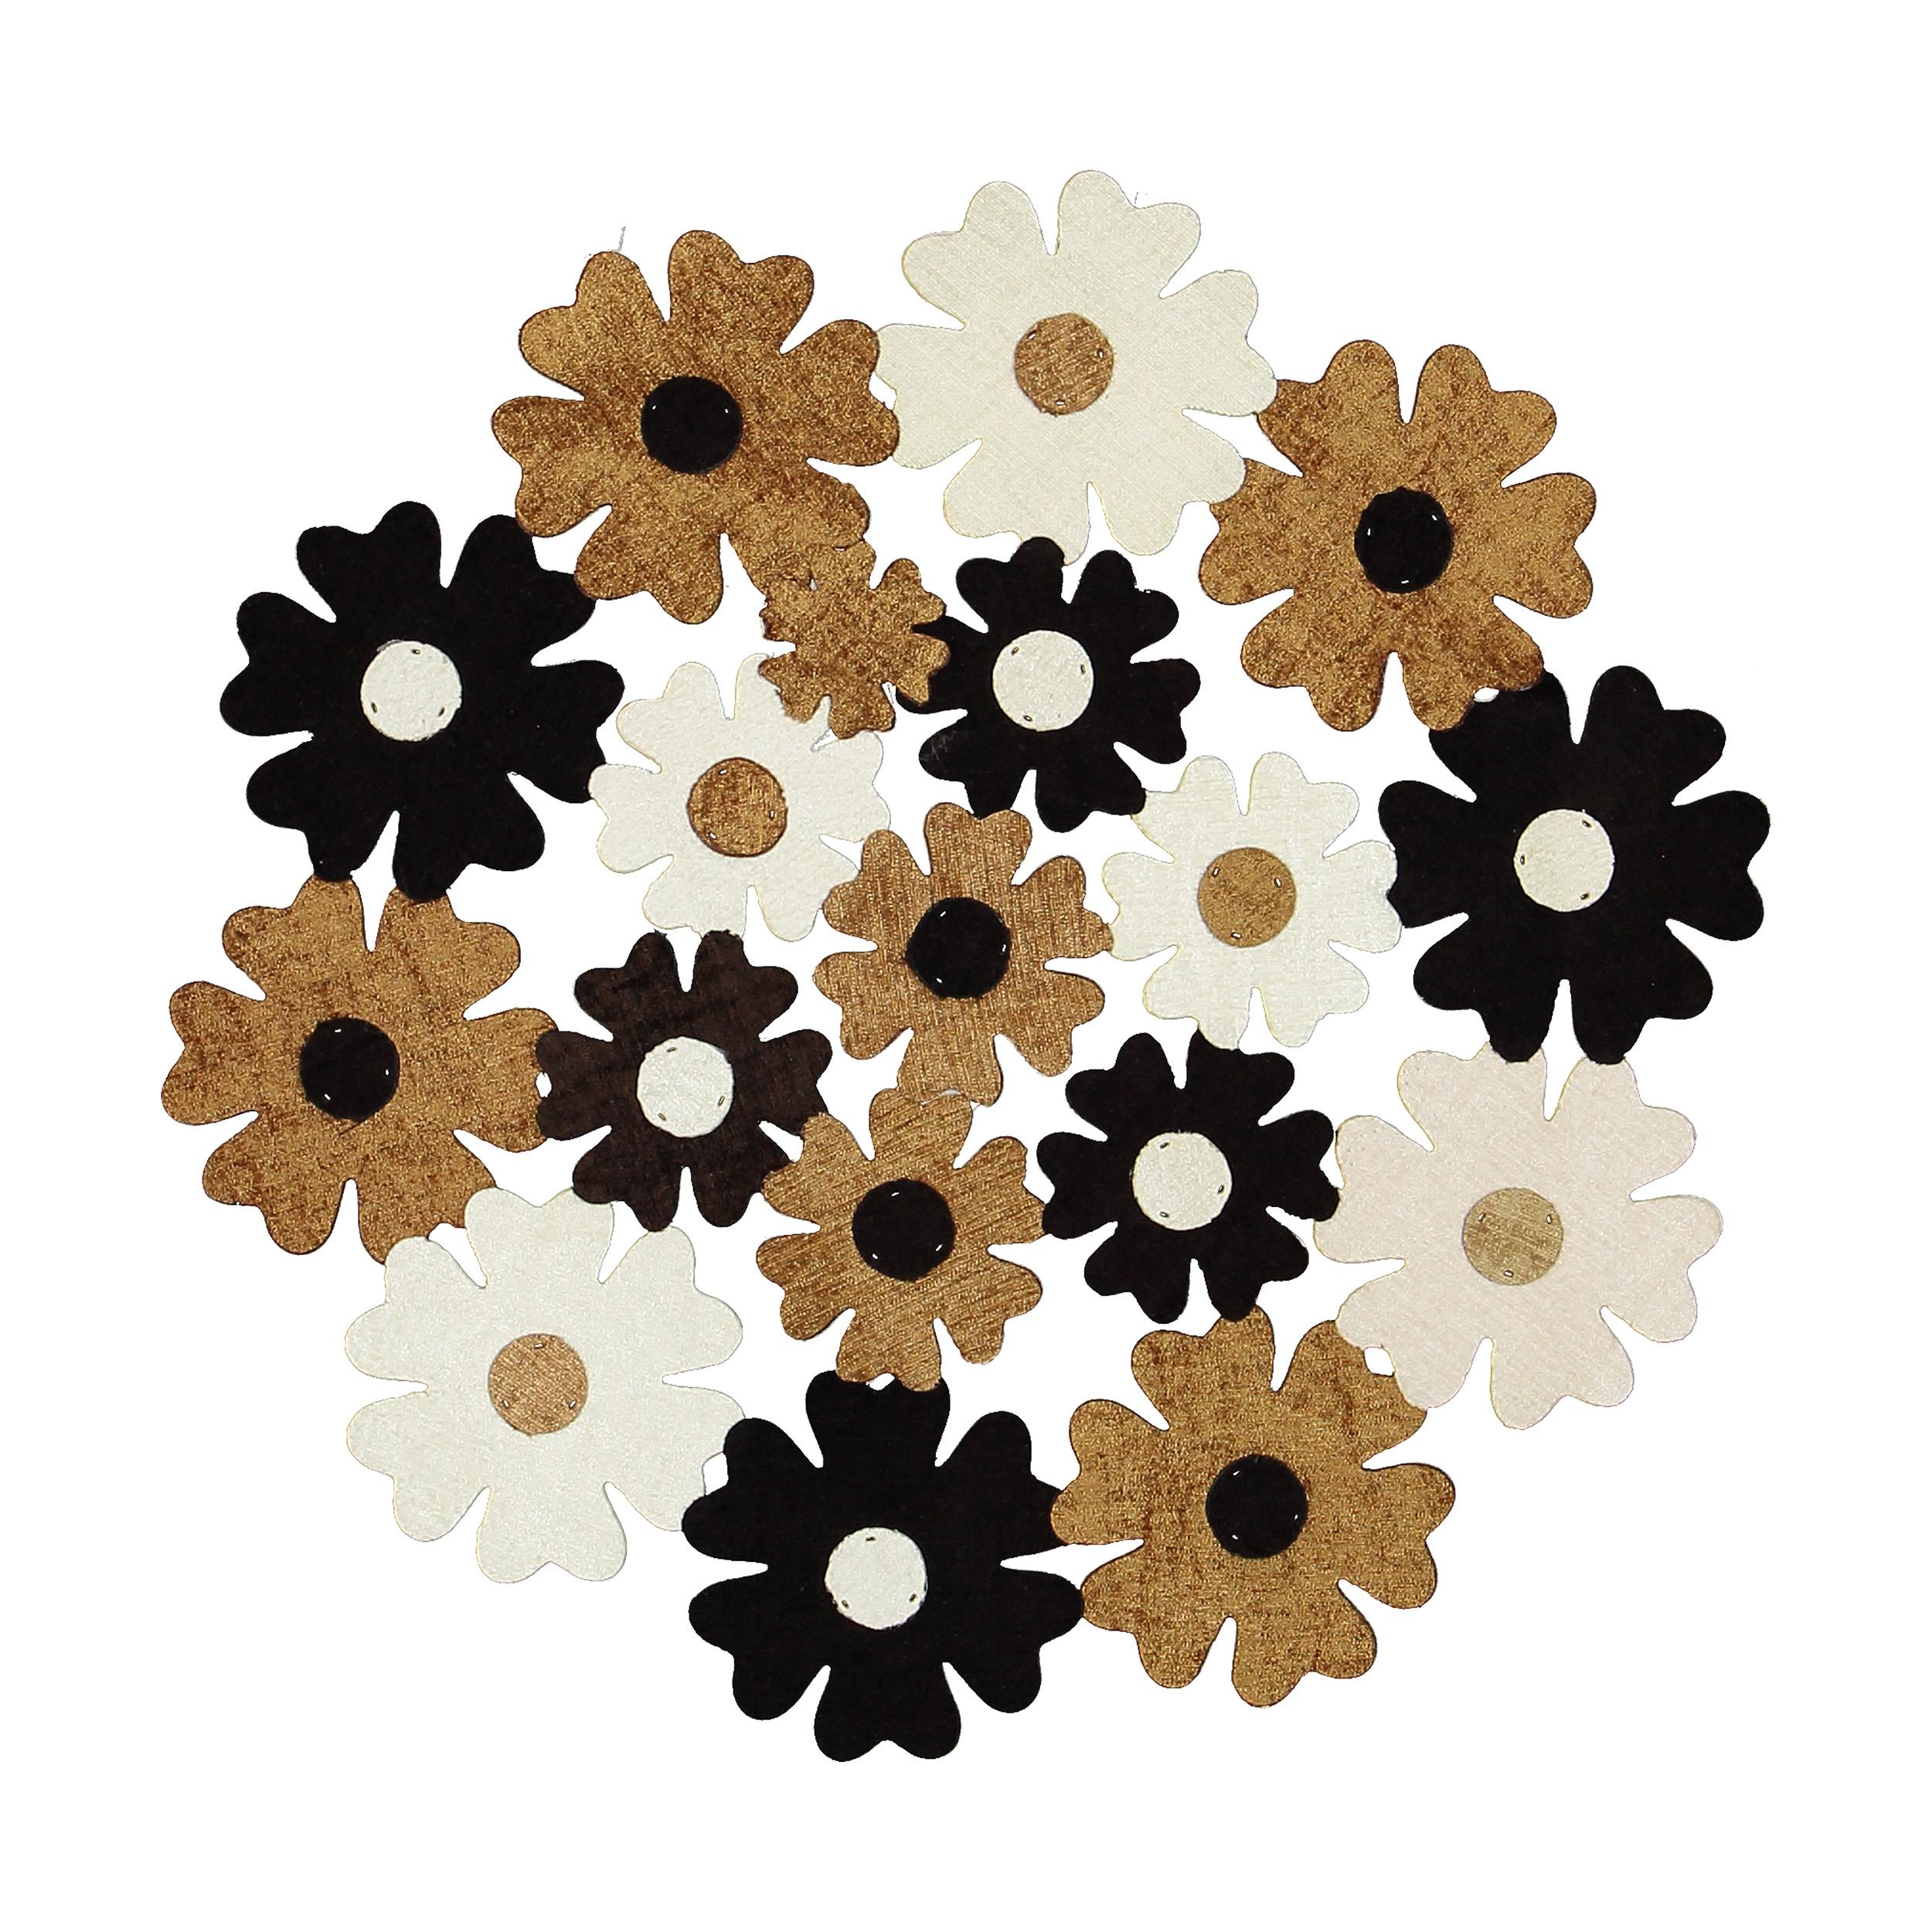 عکس رومیزی طرح گل کد 01